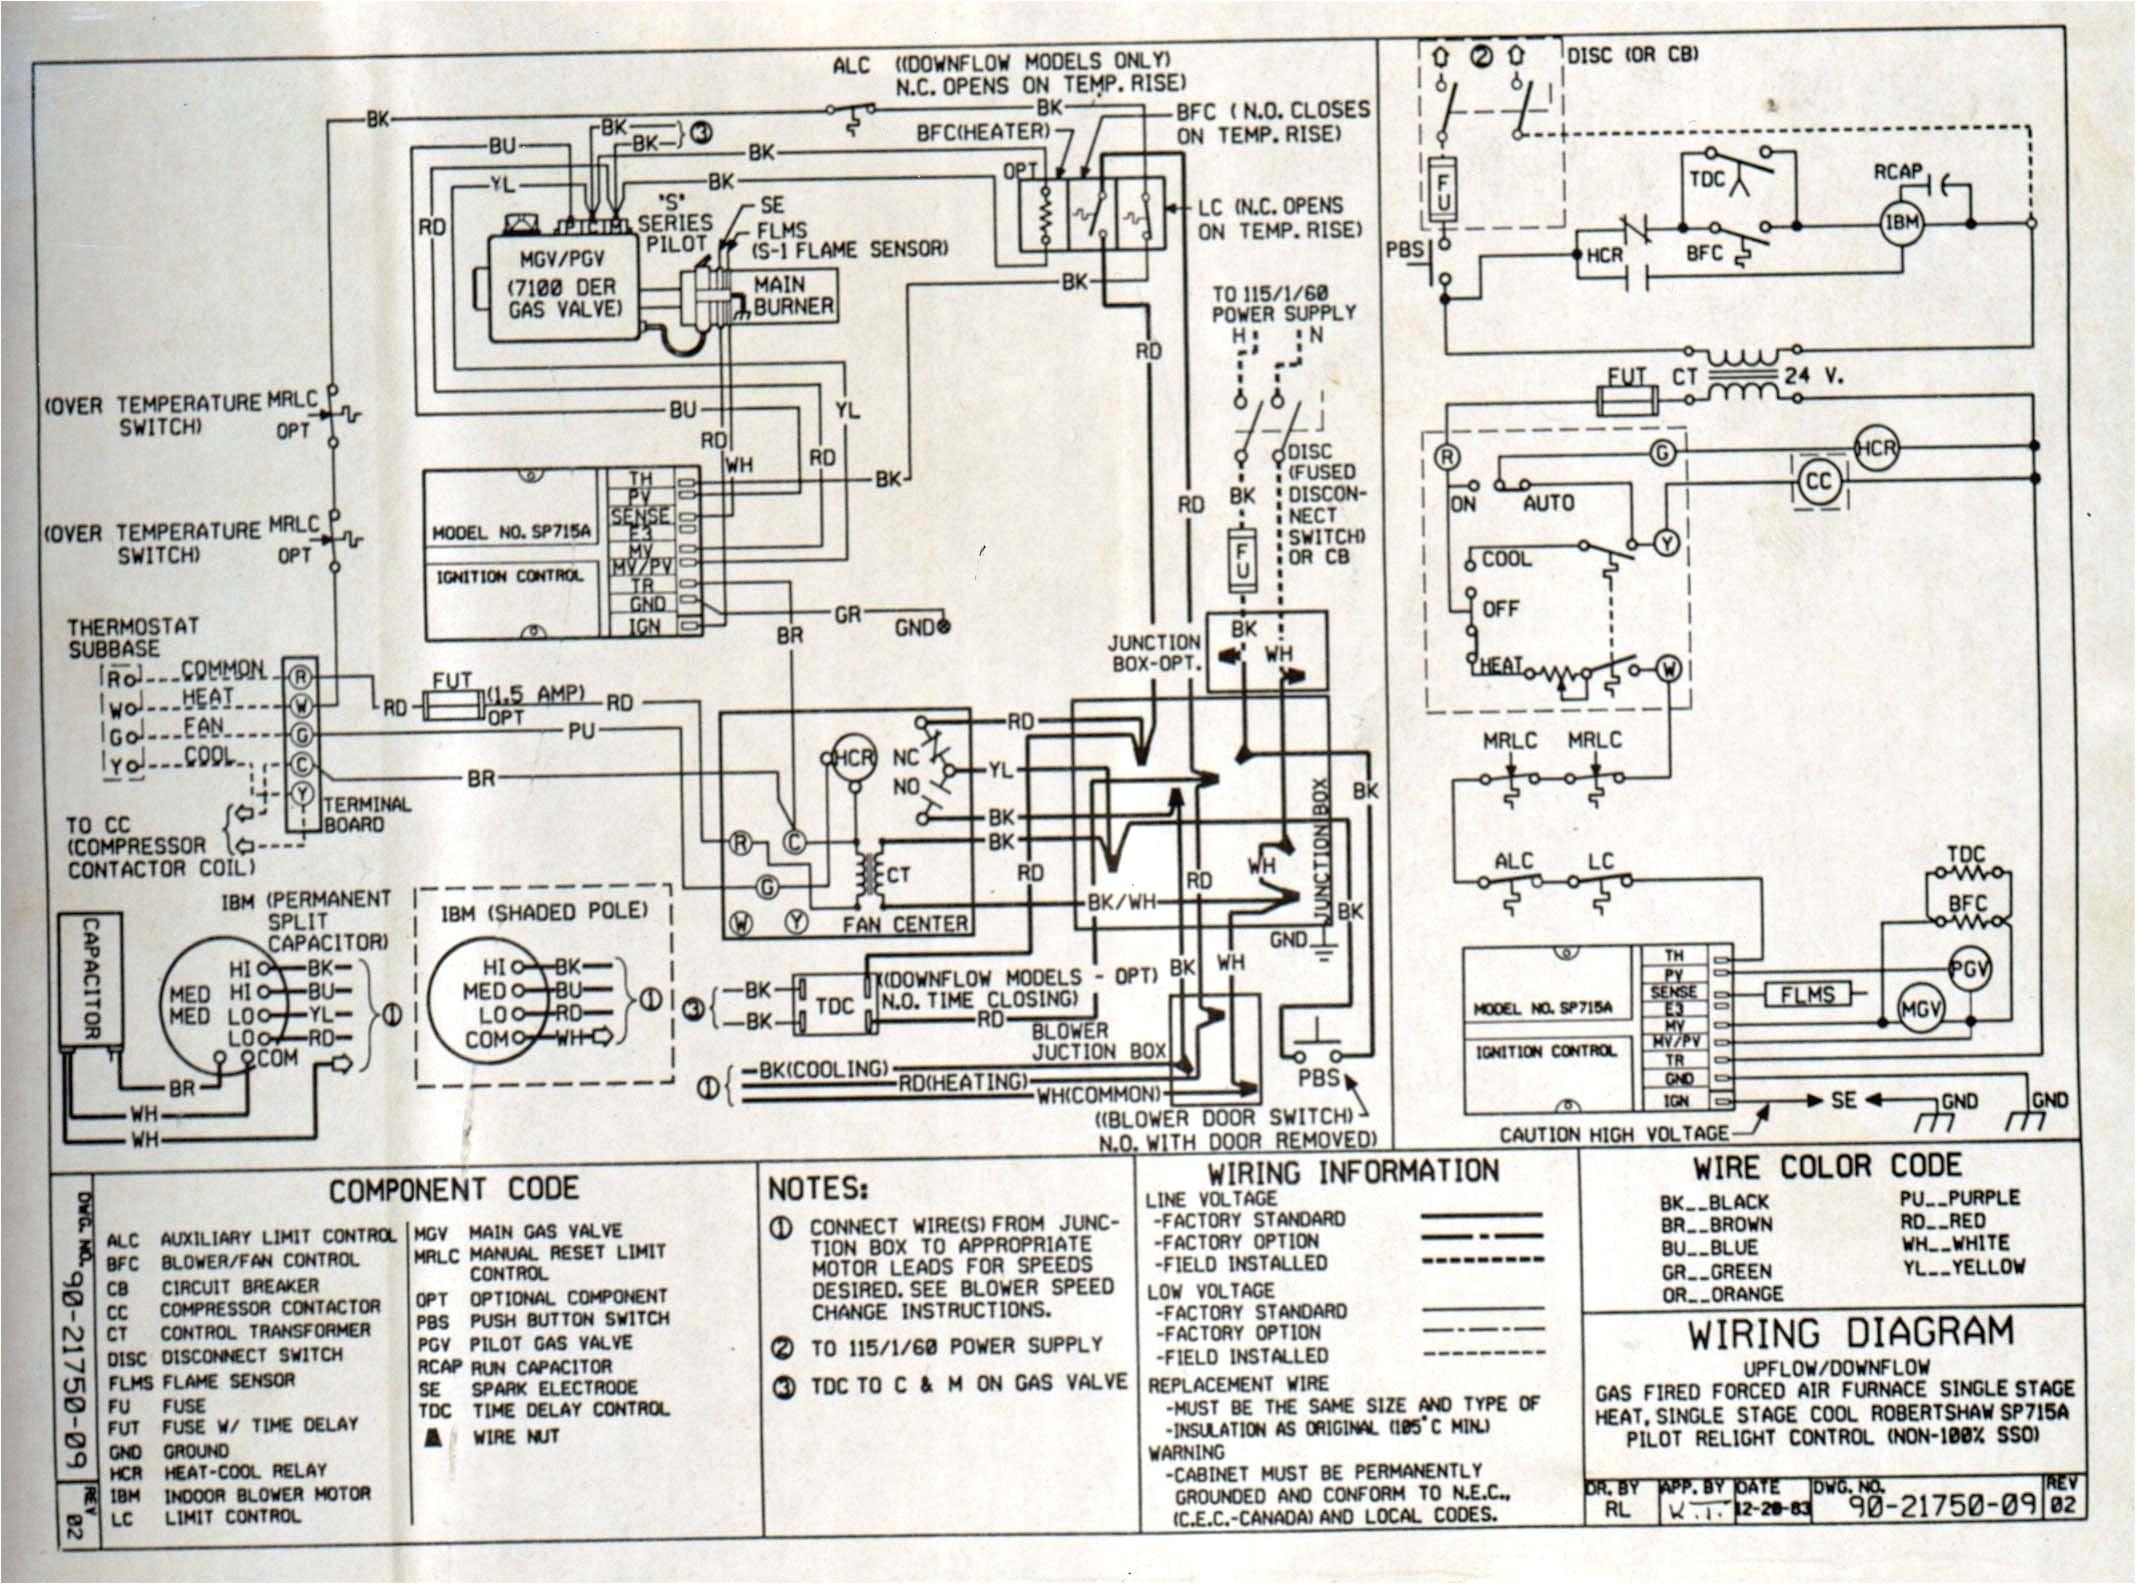 wheel horse raider 12 model 6 4112 wiring diagram wiring diagramslennox wiring schematics wiring diagram info wheel horse raider 12 model 6 4112 wiring diagram